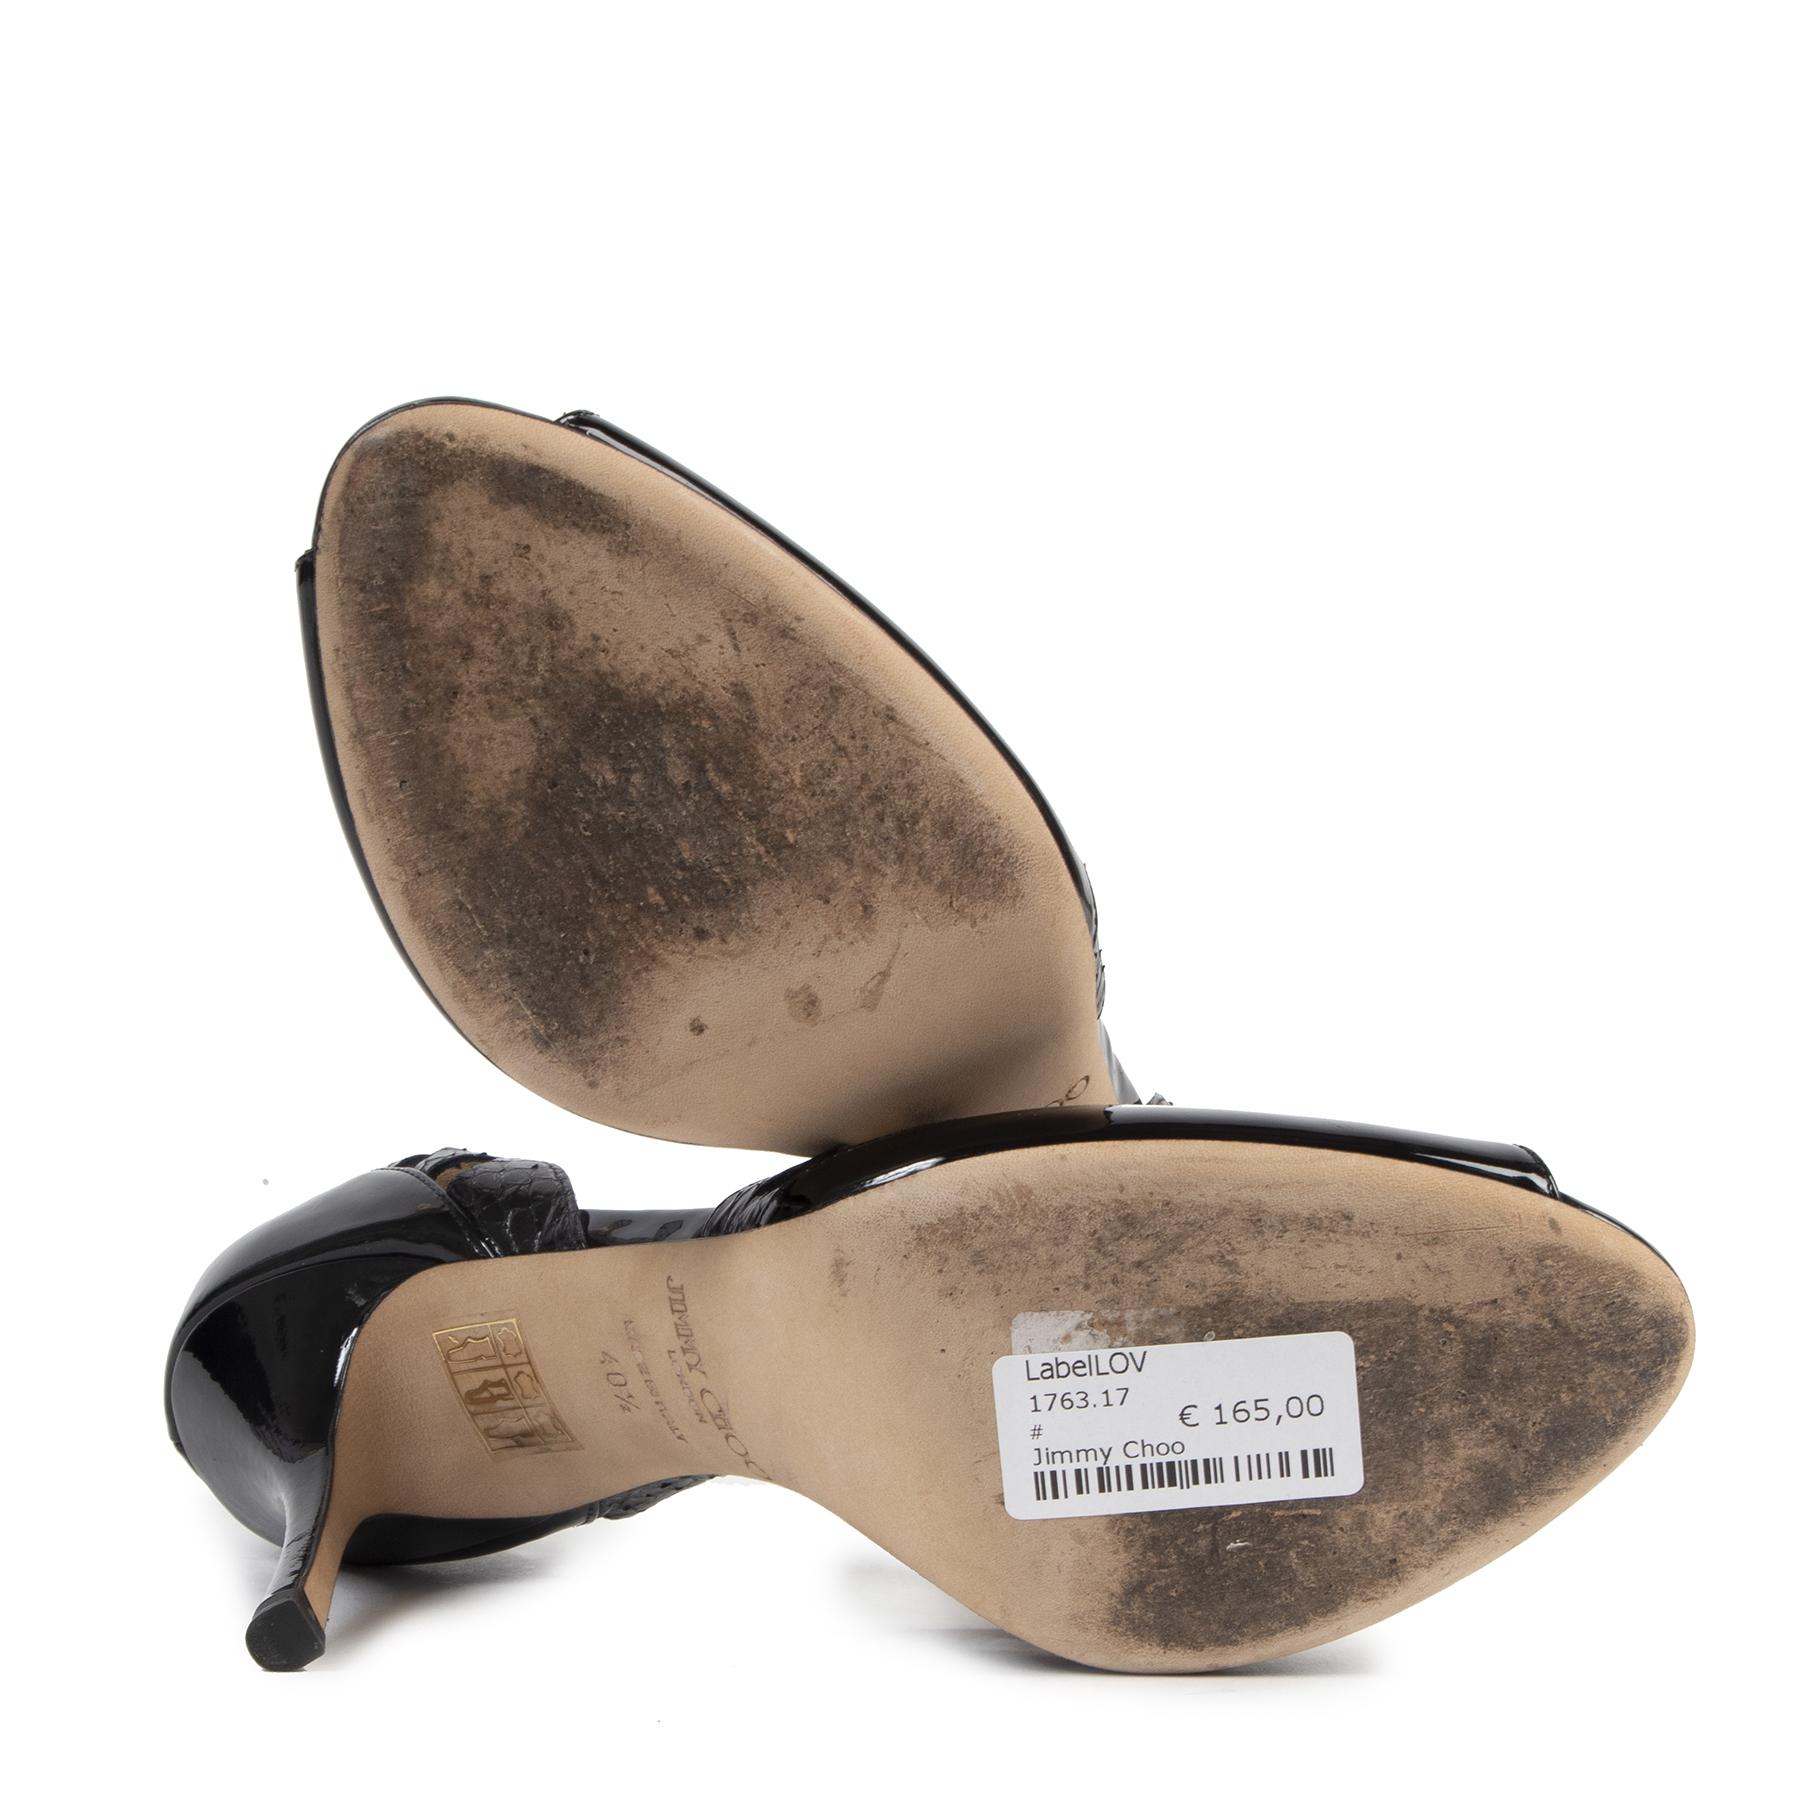 Authentieke tweedehands vintage Jimmy Choo Patent Leather Perforated Pumps - Size 40,5 koop online webshop LabelLOV